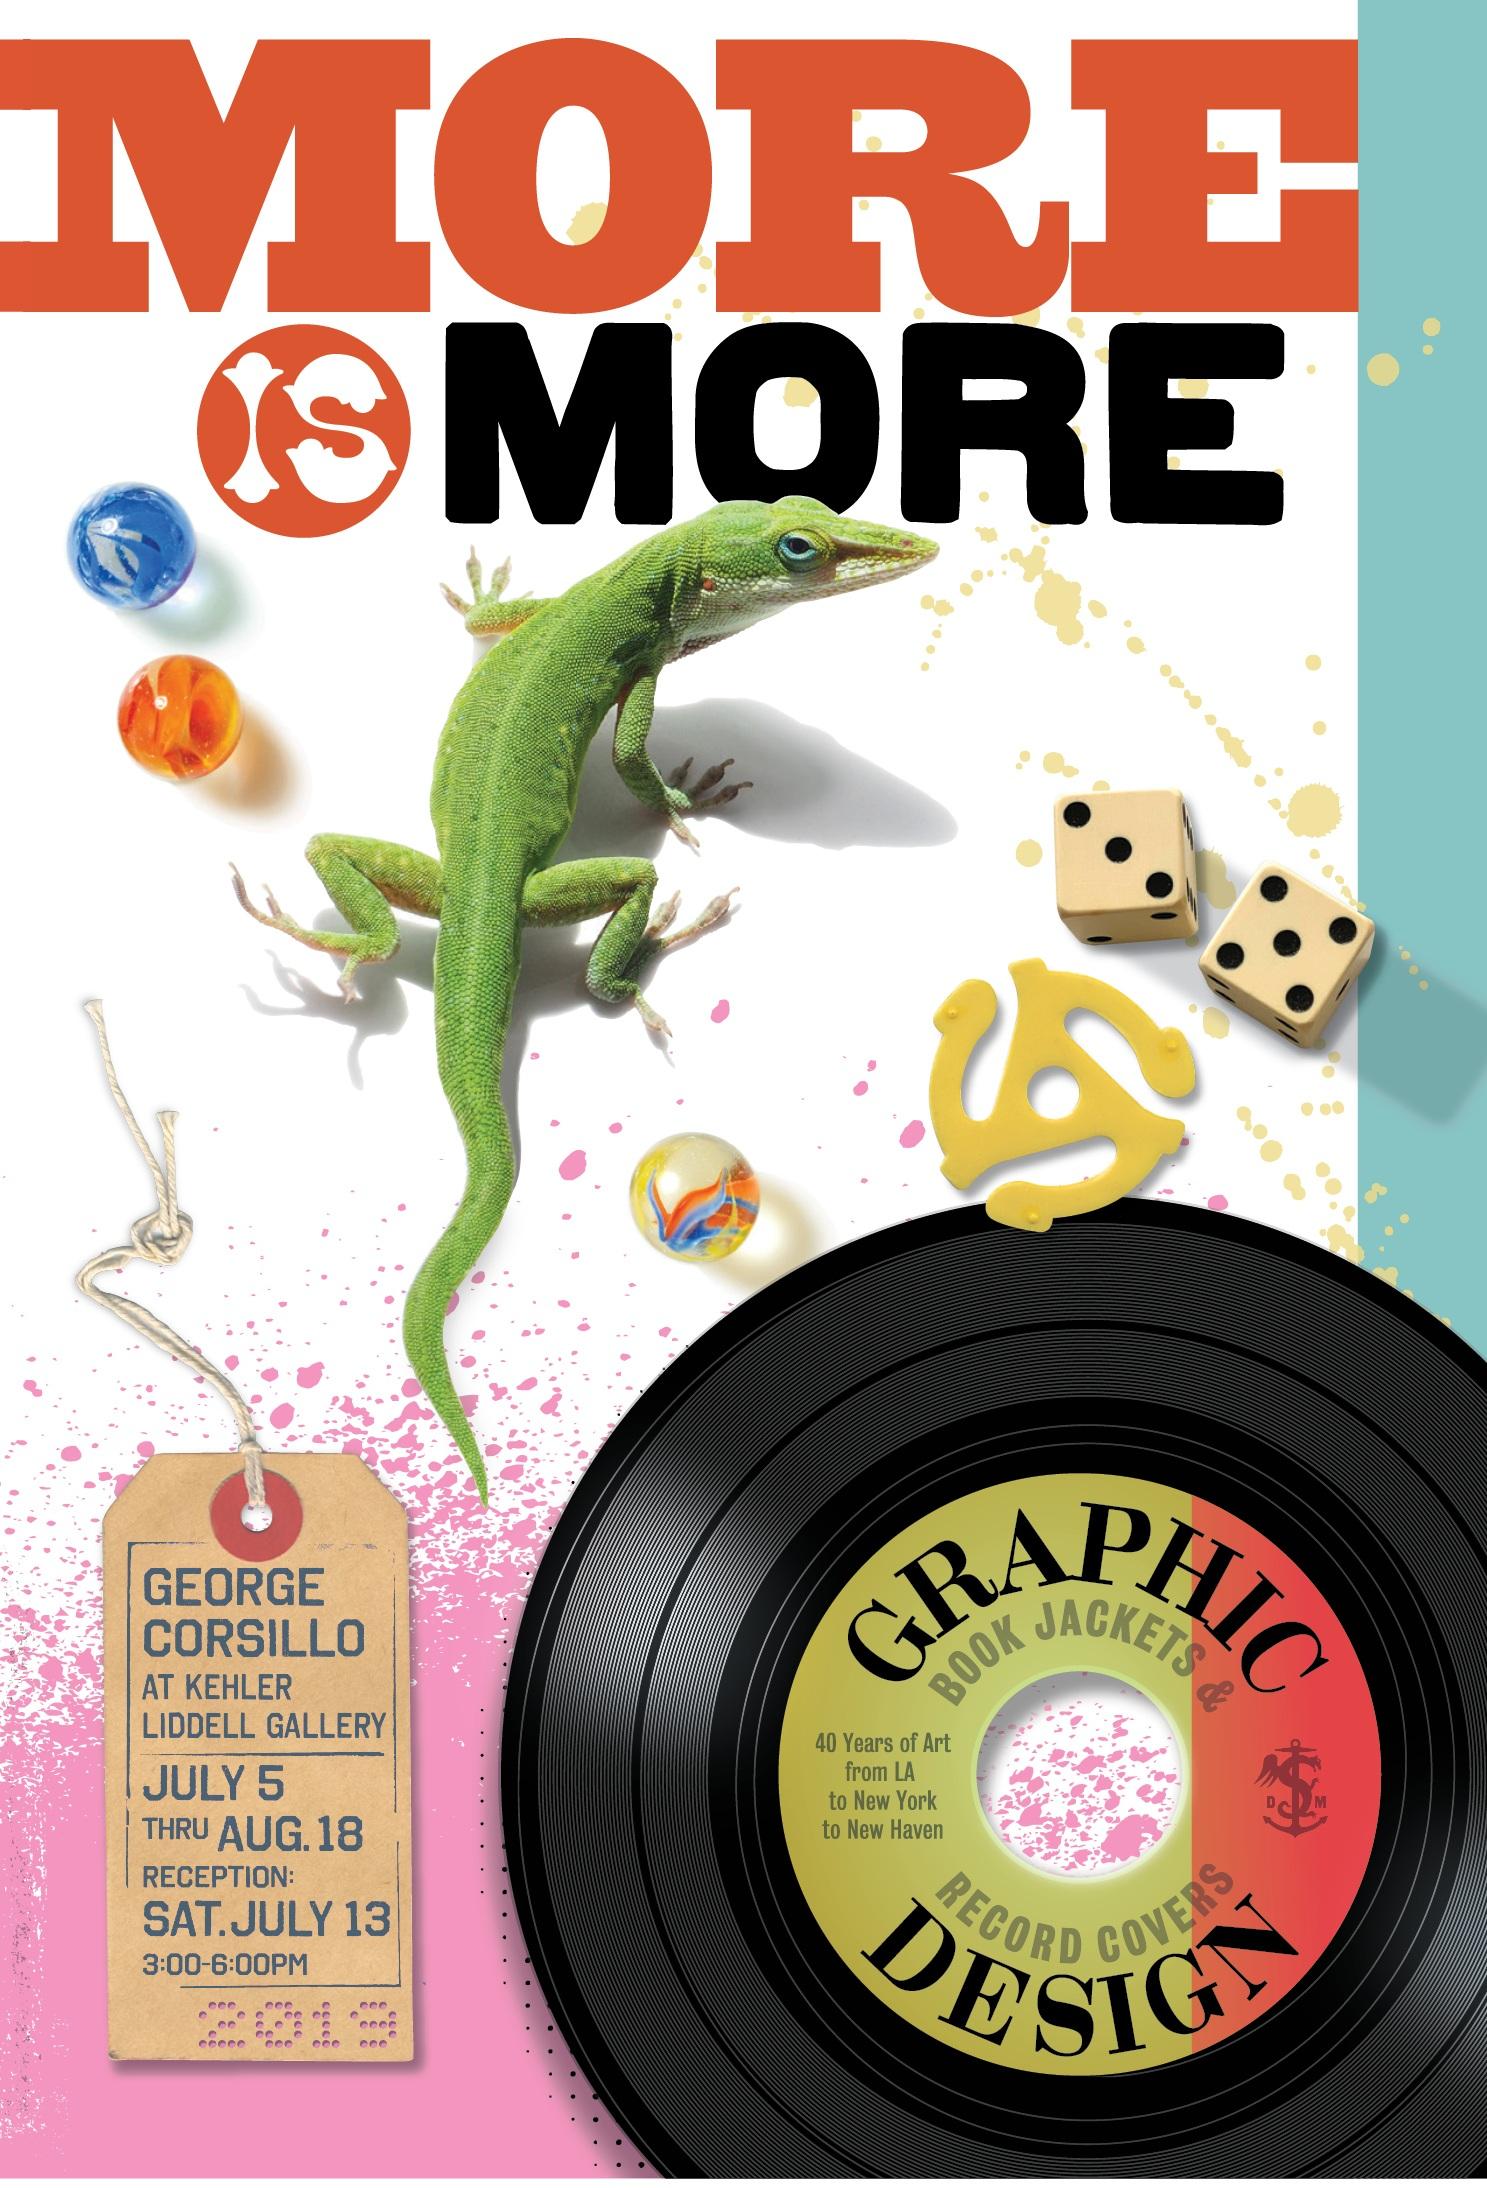 MoreIsMore-Postcard-4x6-FRONT.jpg